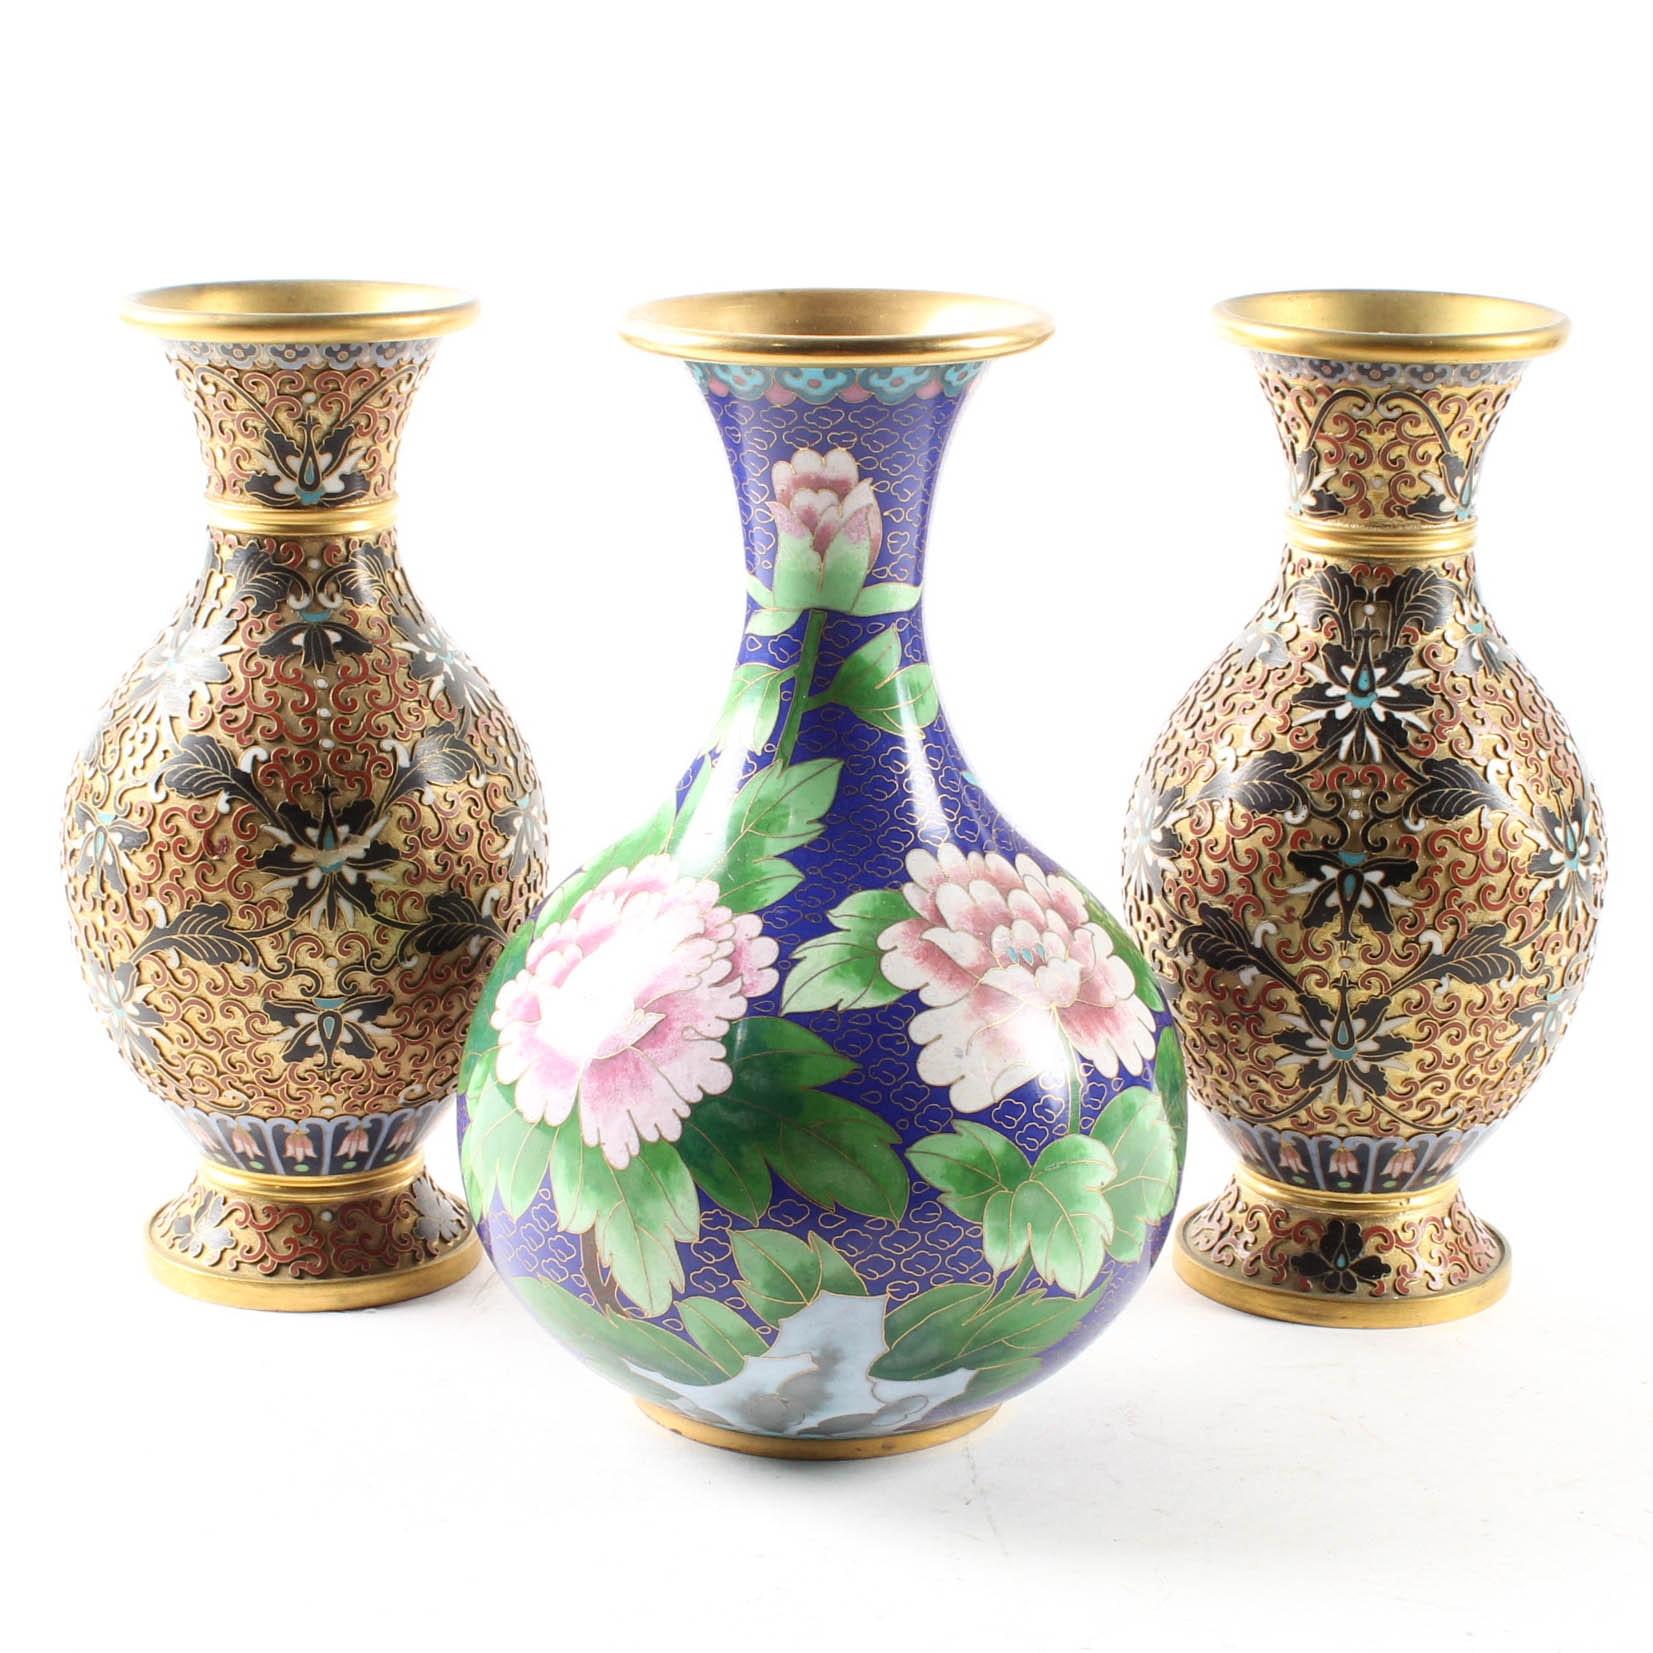 East Asian Cloisonne Vases